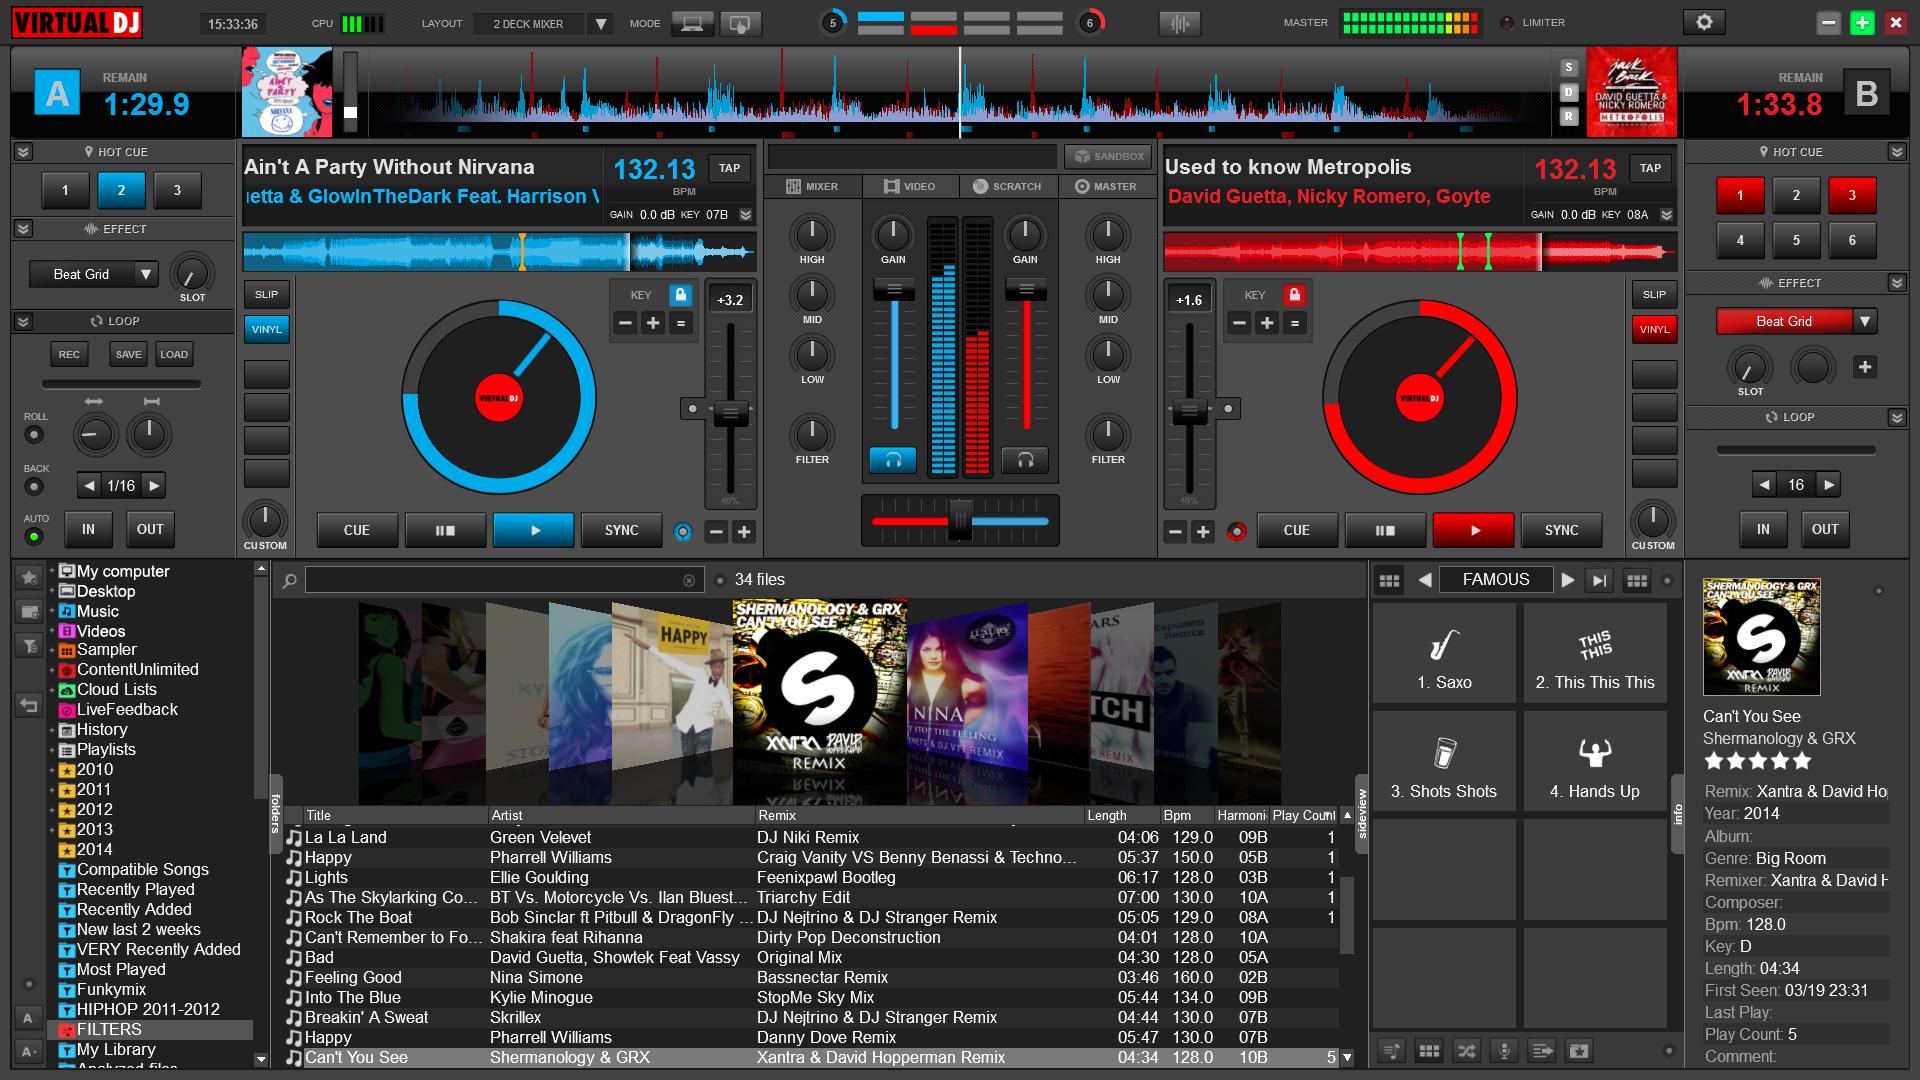 Virtual DJ Pro 8 free download for window